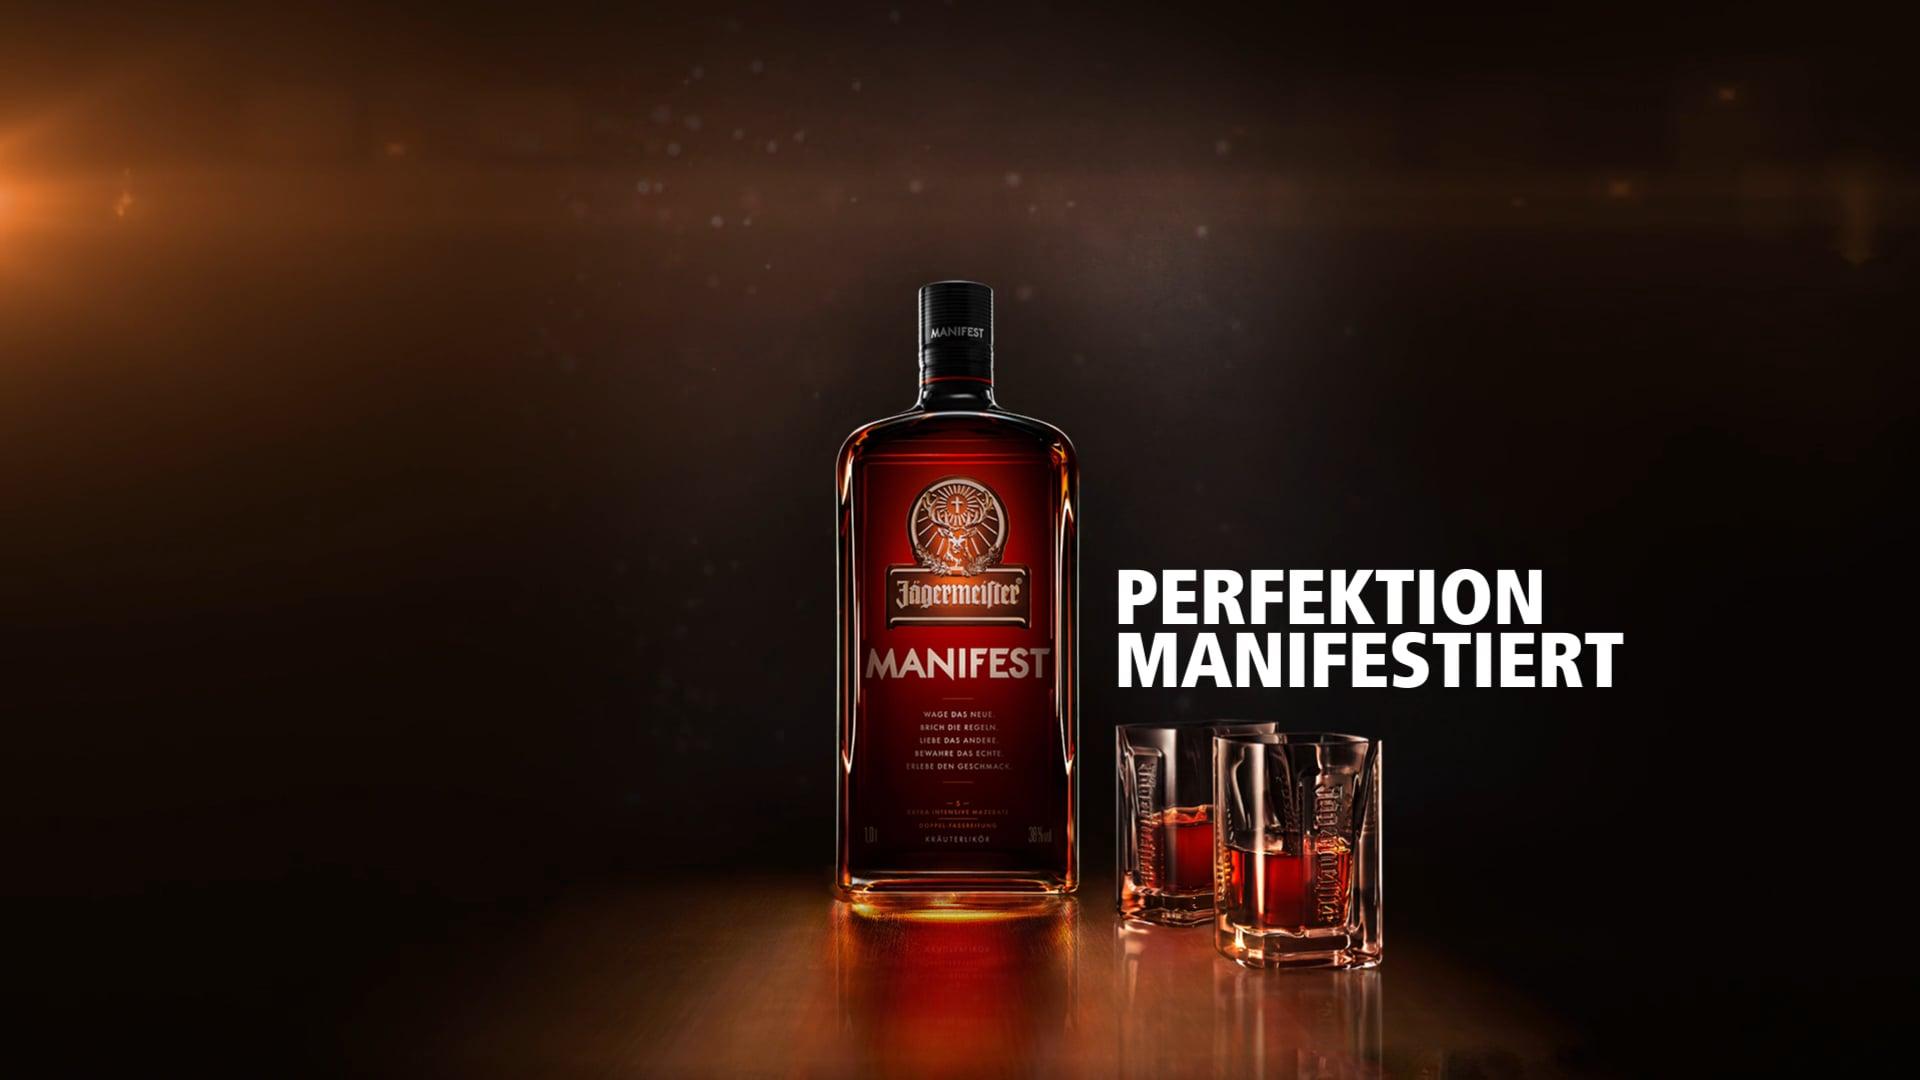 Jägermeister Manifest Commercial